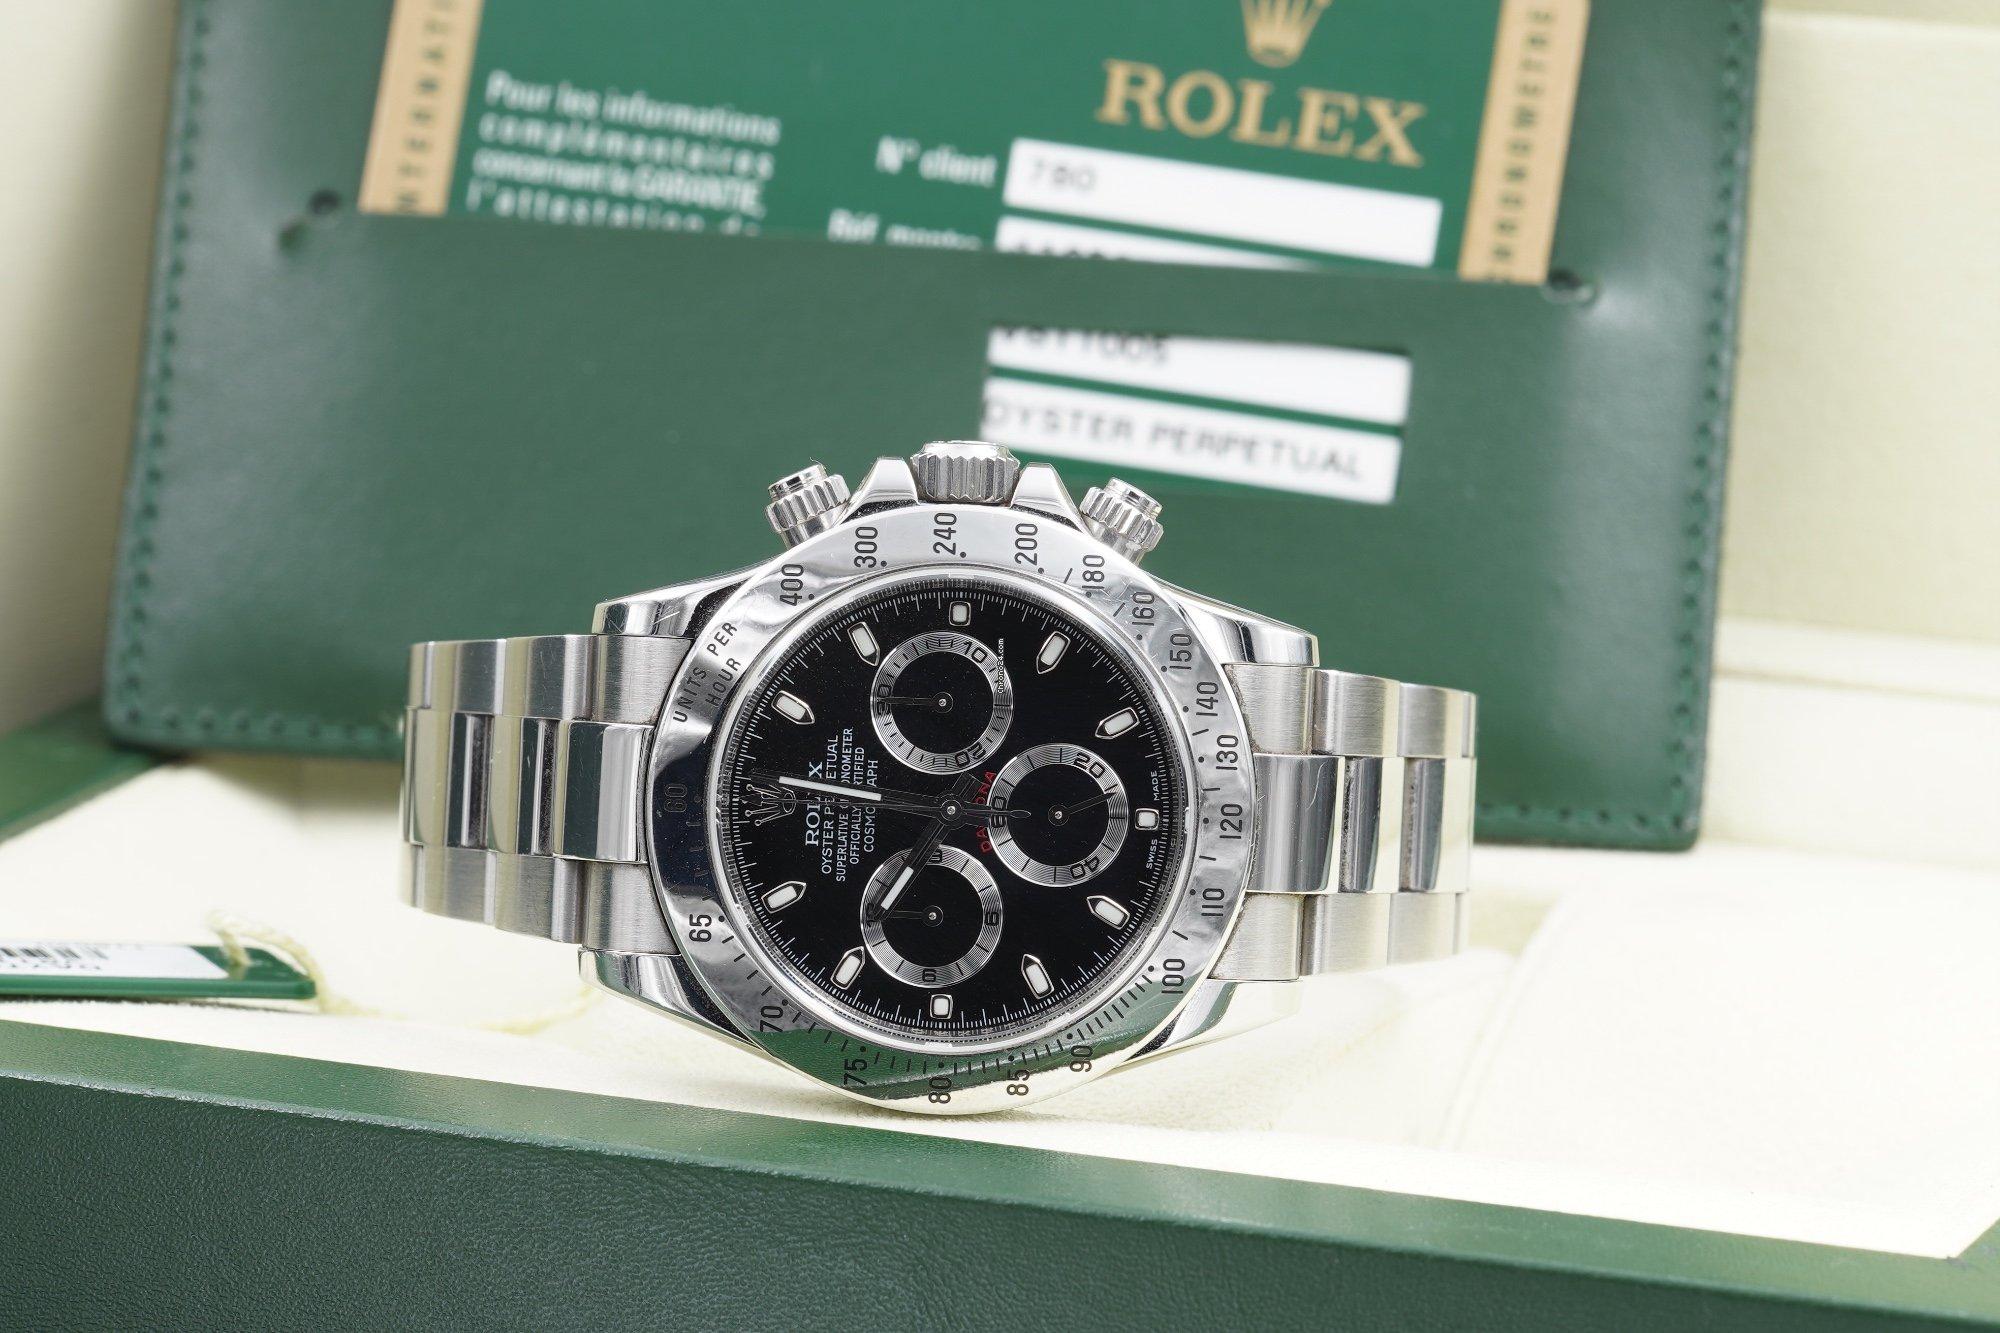 best service 38af7 1e005 Rolex Daytona 116520 V Serial Like New Full Set for Rp ...